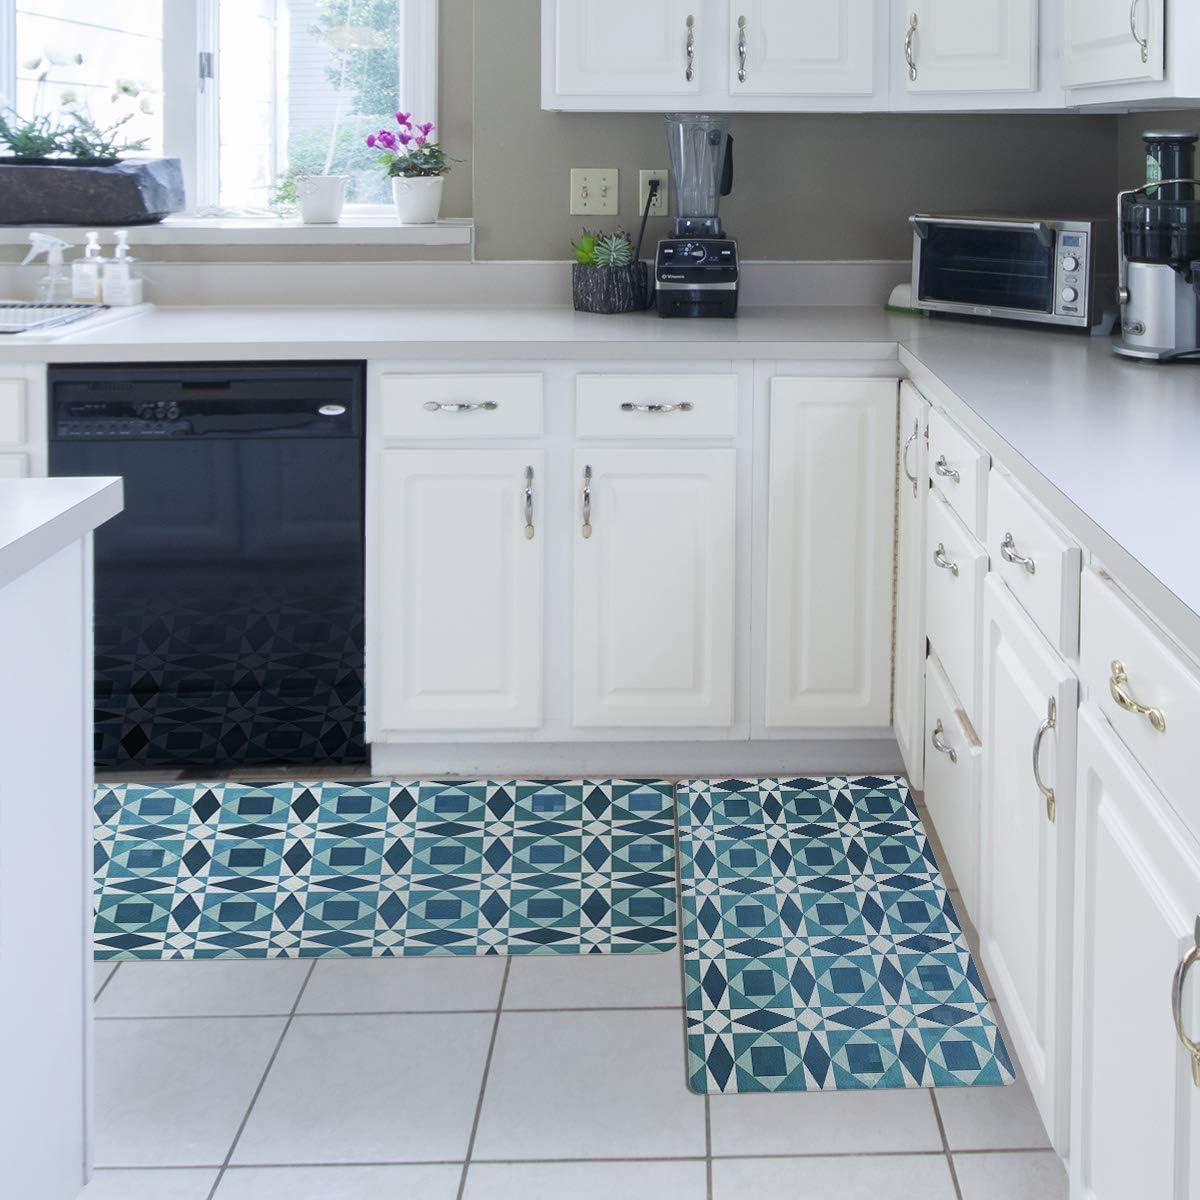 Amazon.com: Geometric Kitchen Rug Set, Kitchen Floor Mats 7 Piece